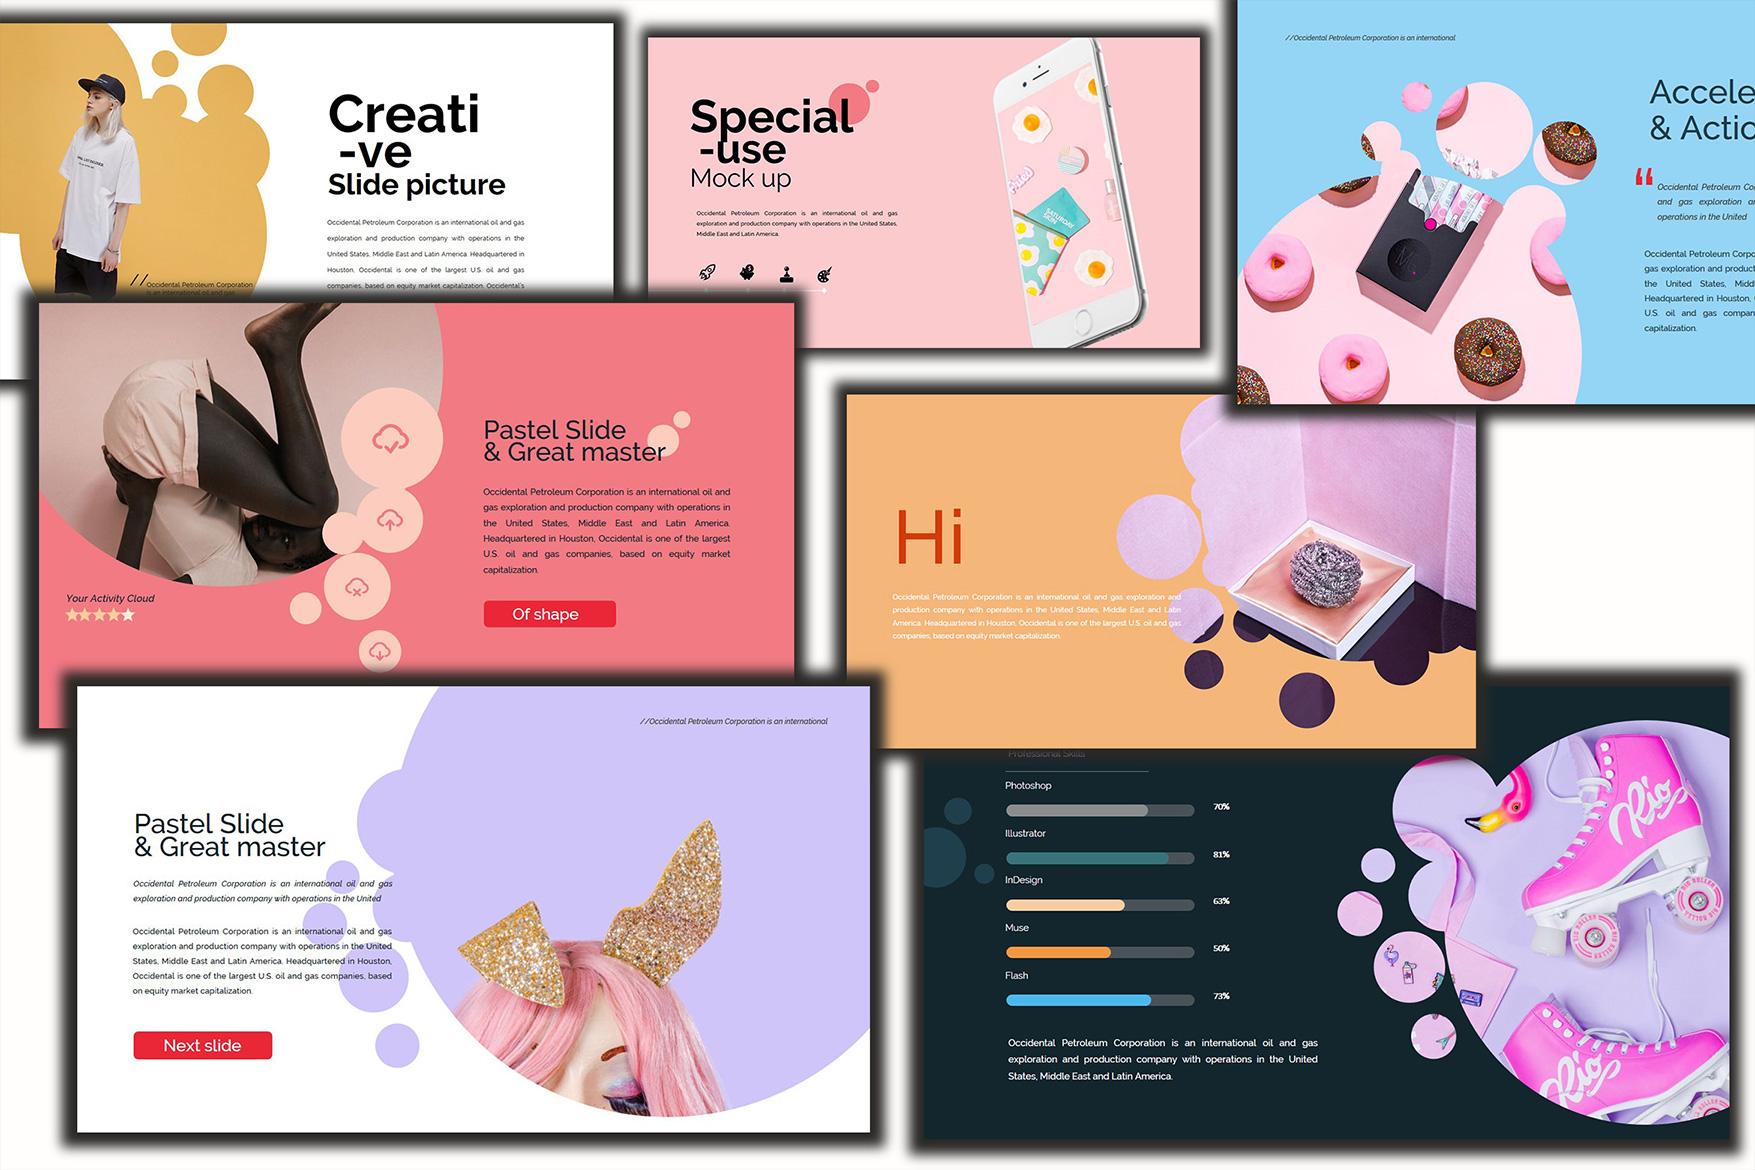 Velvety Fashion Google Slides Presentation example image 3